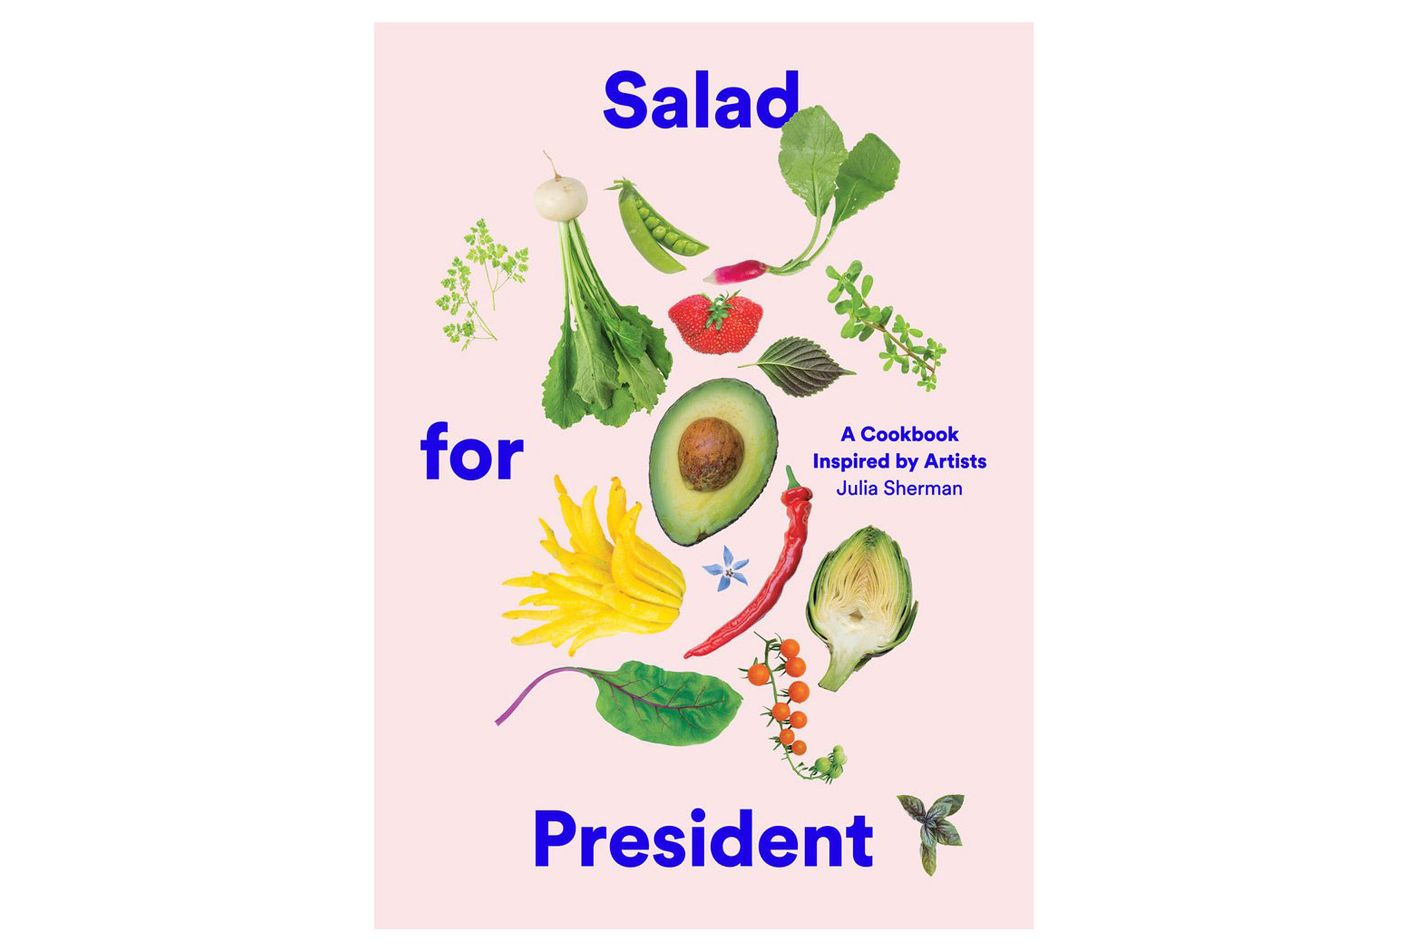 Salad for President